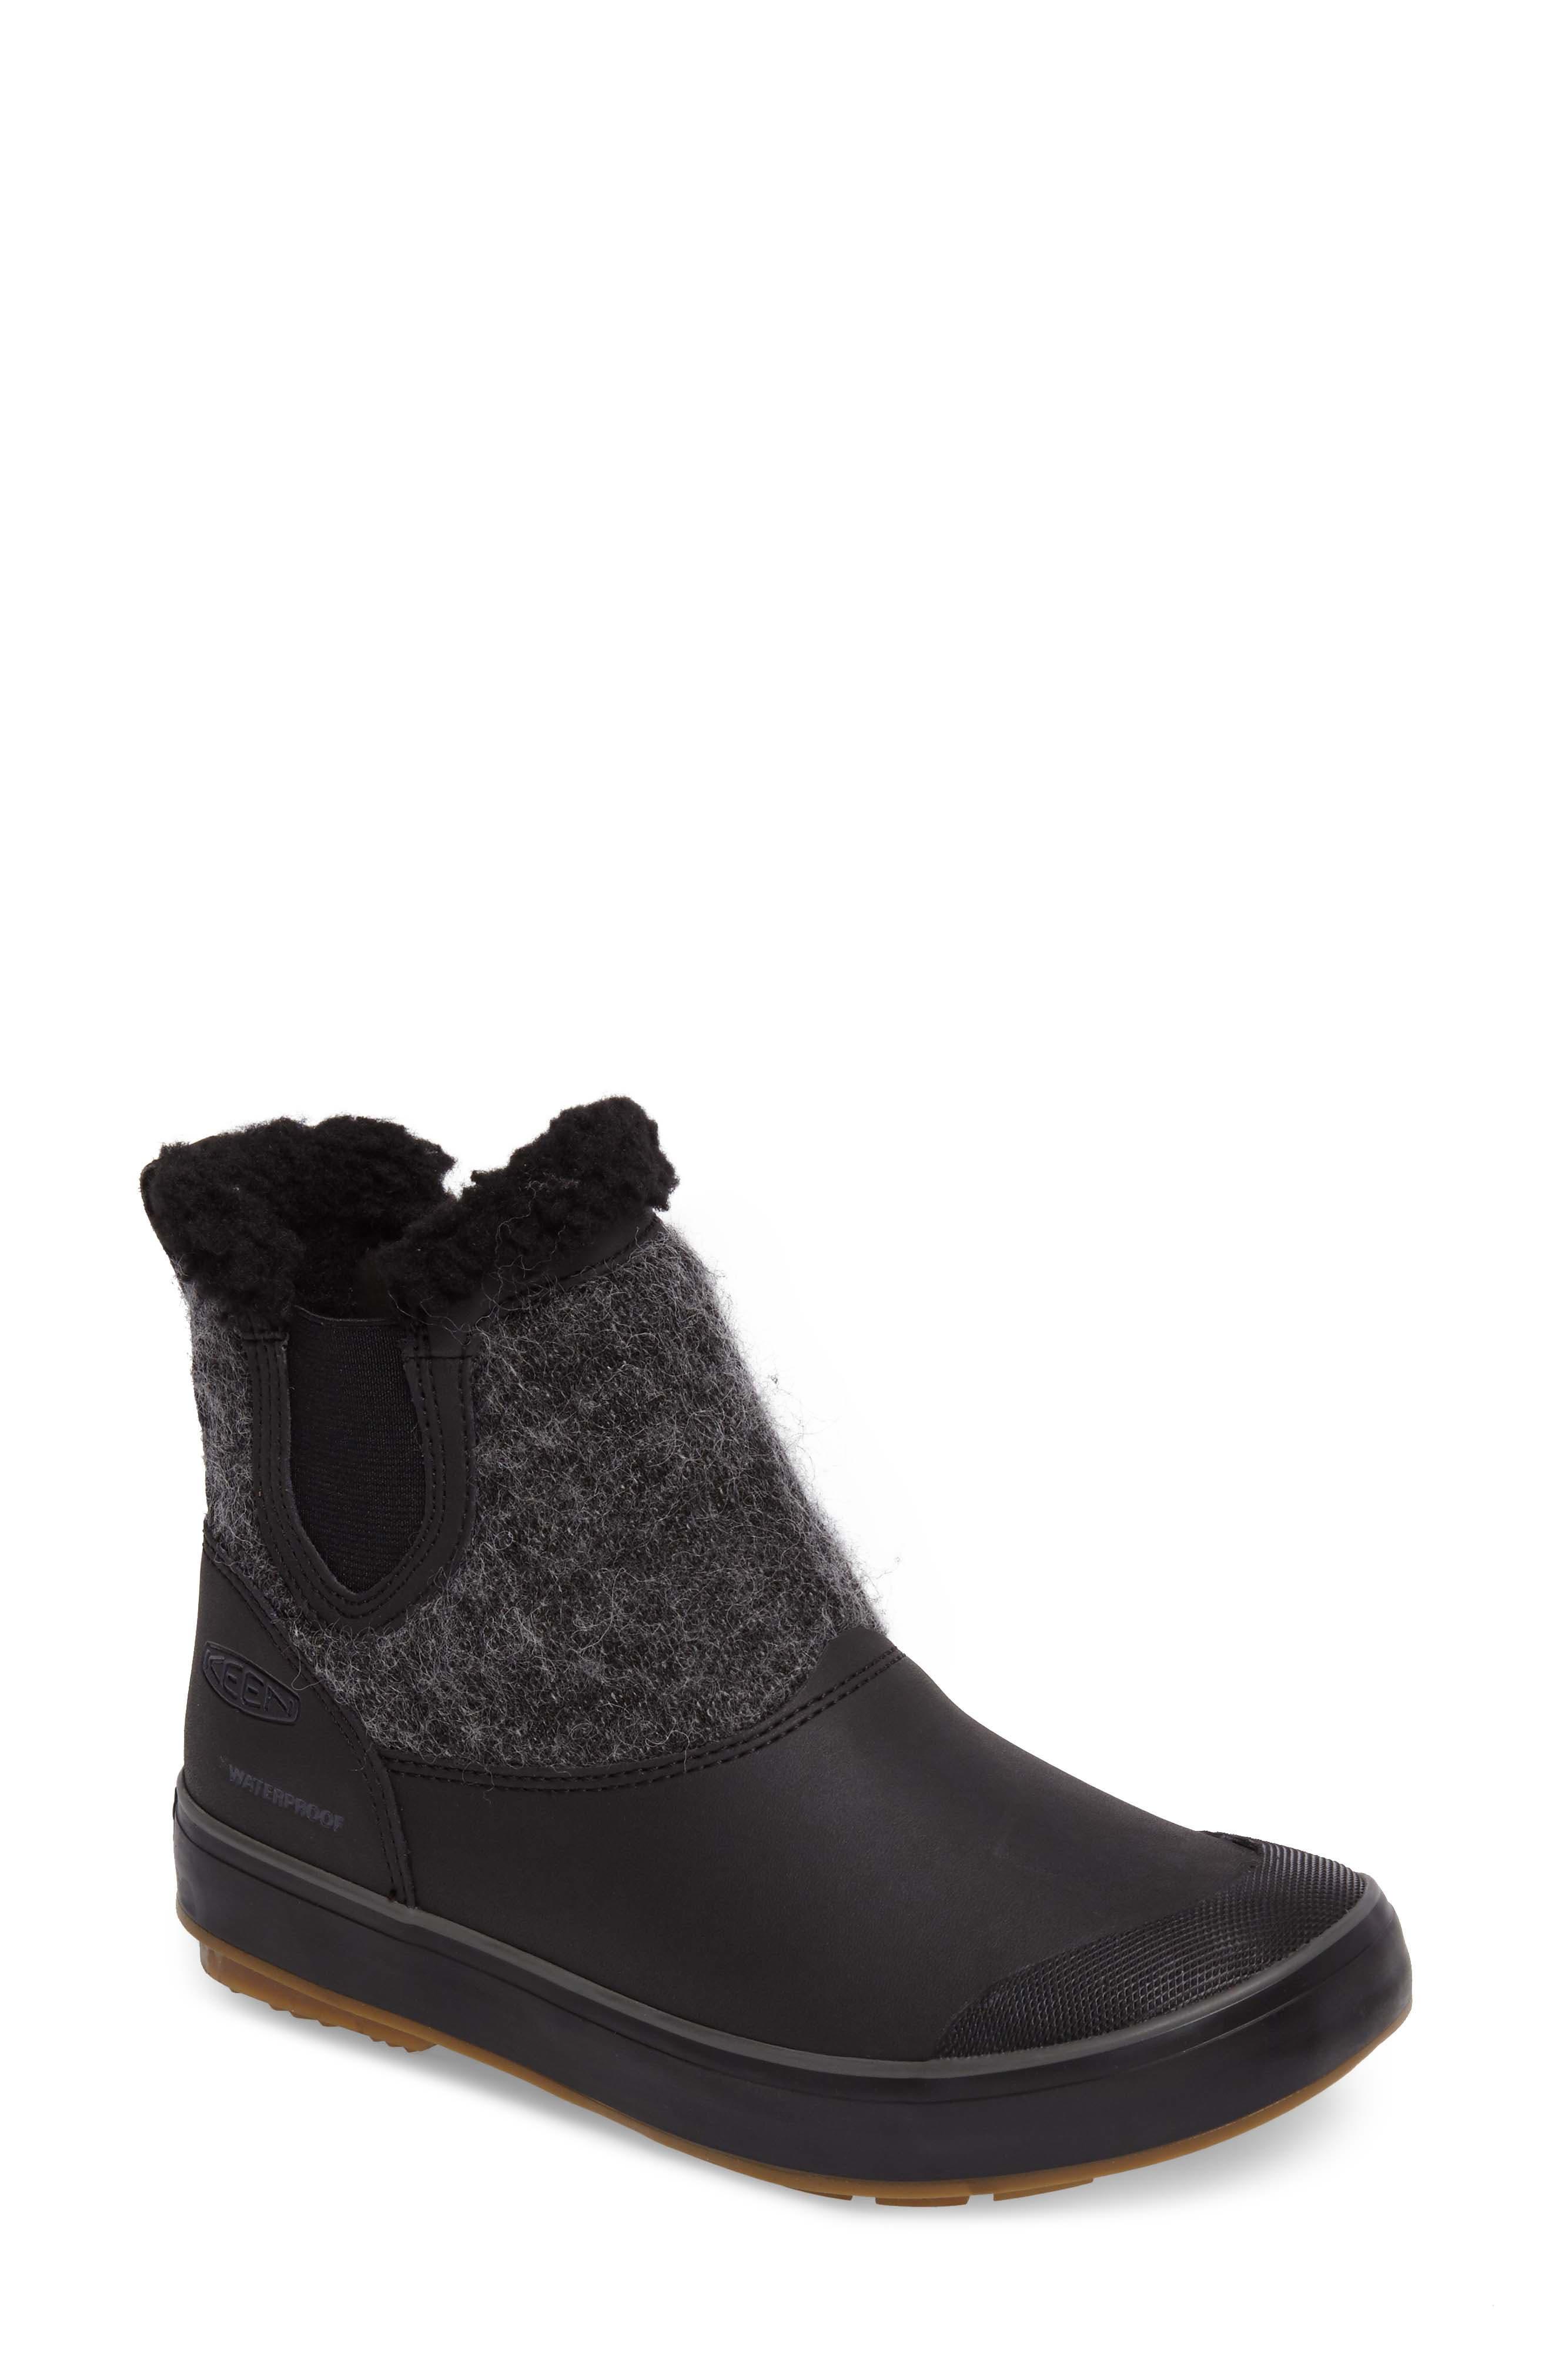 Elsa Chelsea Waterproof Faux Fur Lined Boot,                         Main,                         color, Black Wool Leather